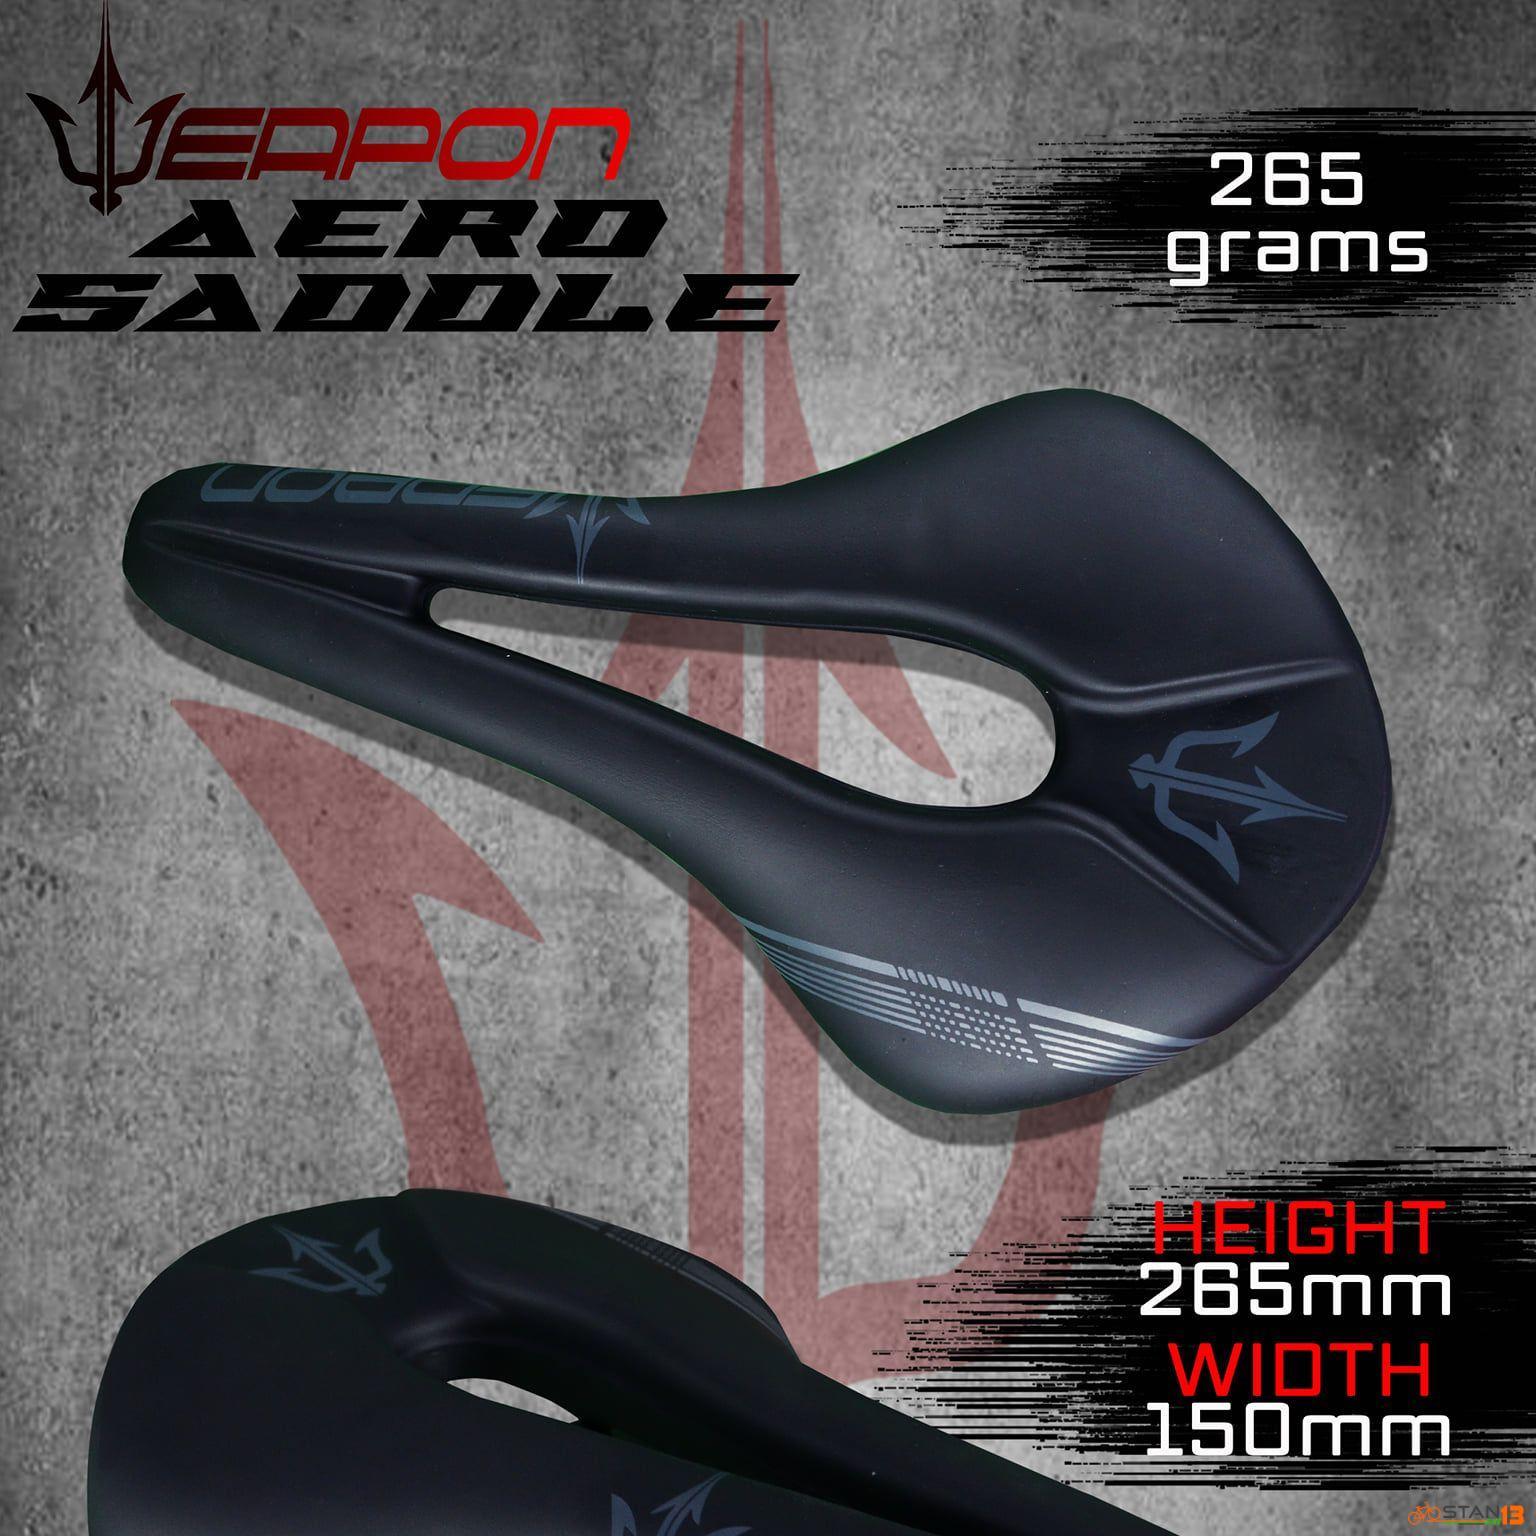 Saddle Weapon Aero Slim Profile Soft and Aerodynamic